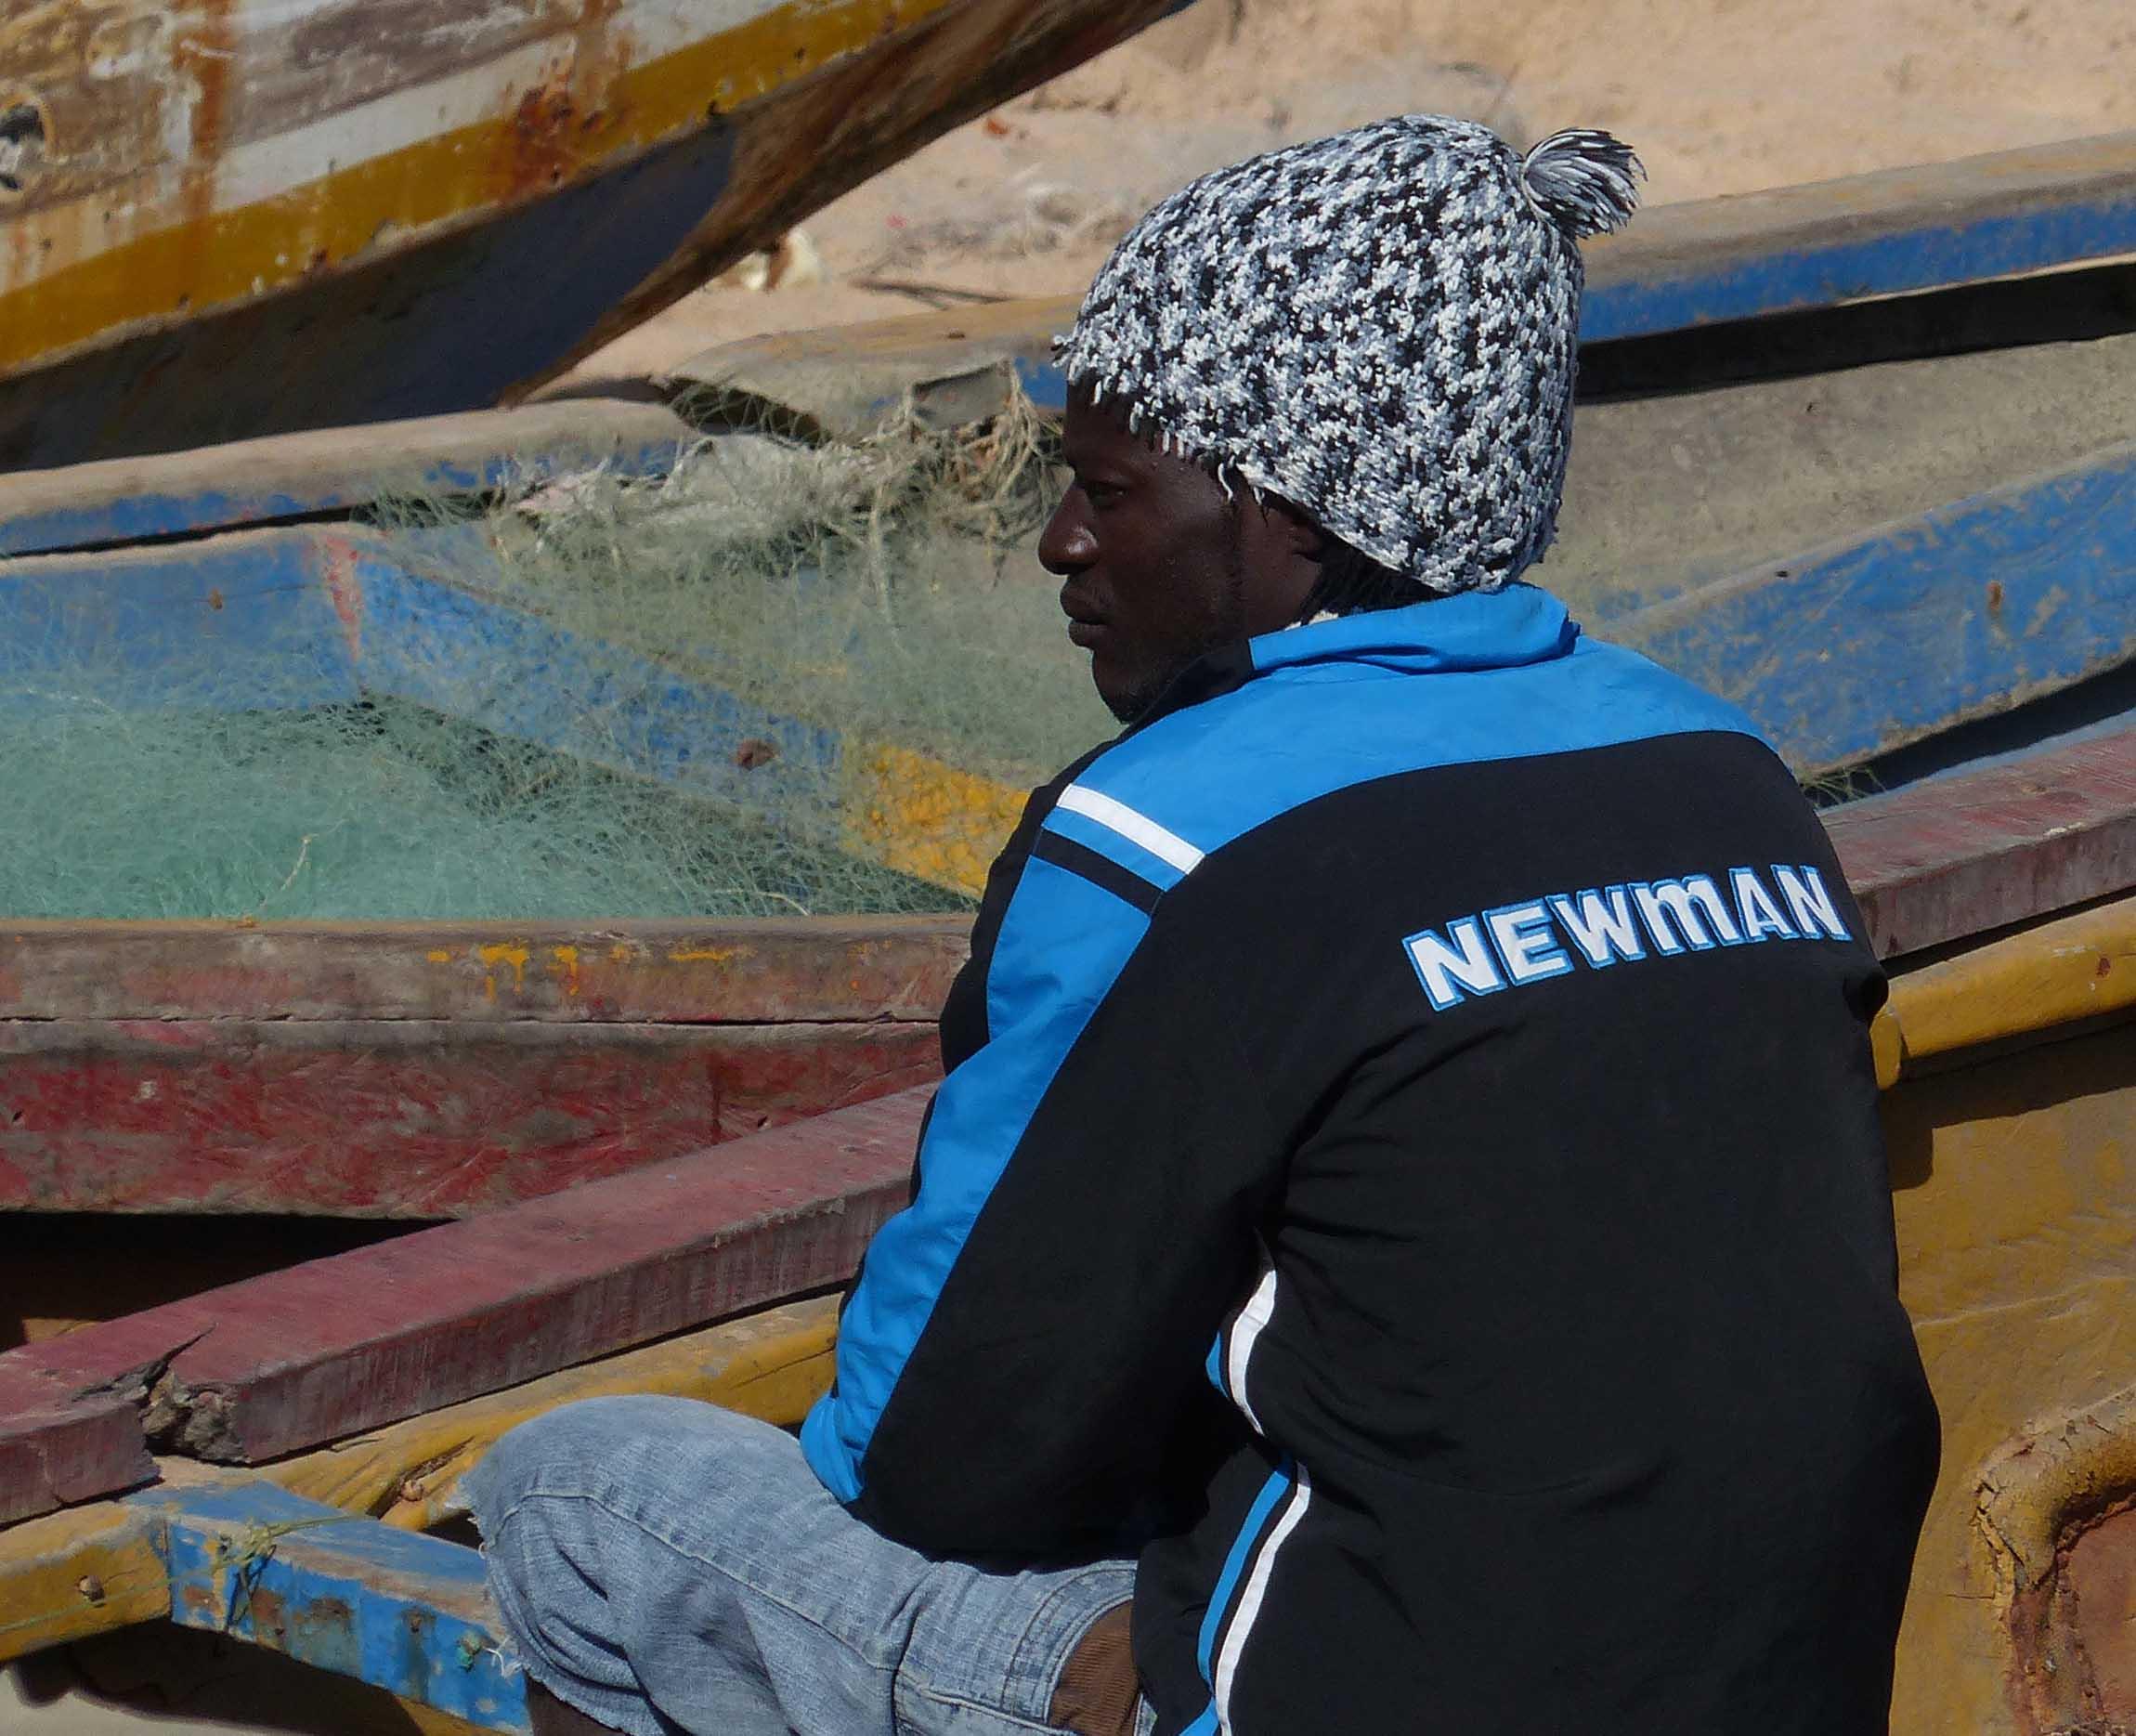 Man sitting among boats on the beach